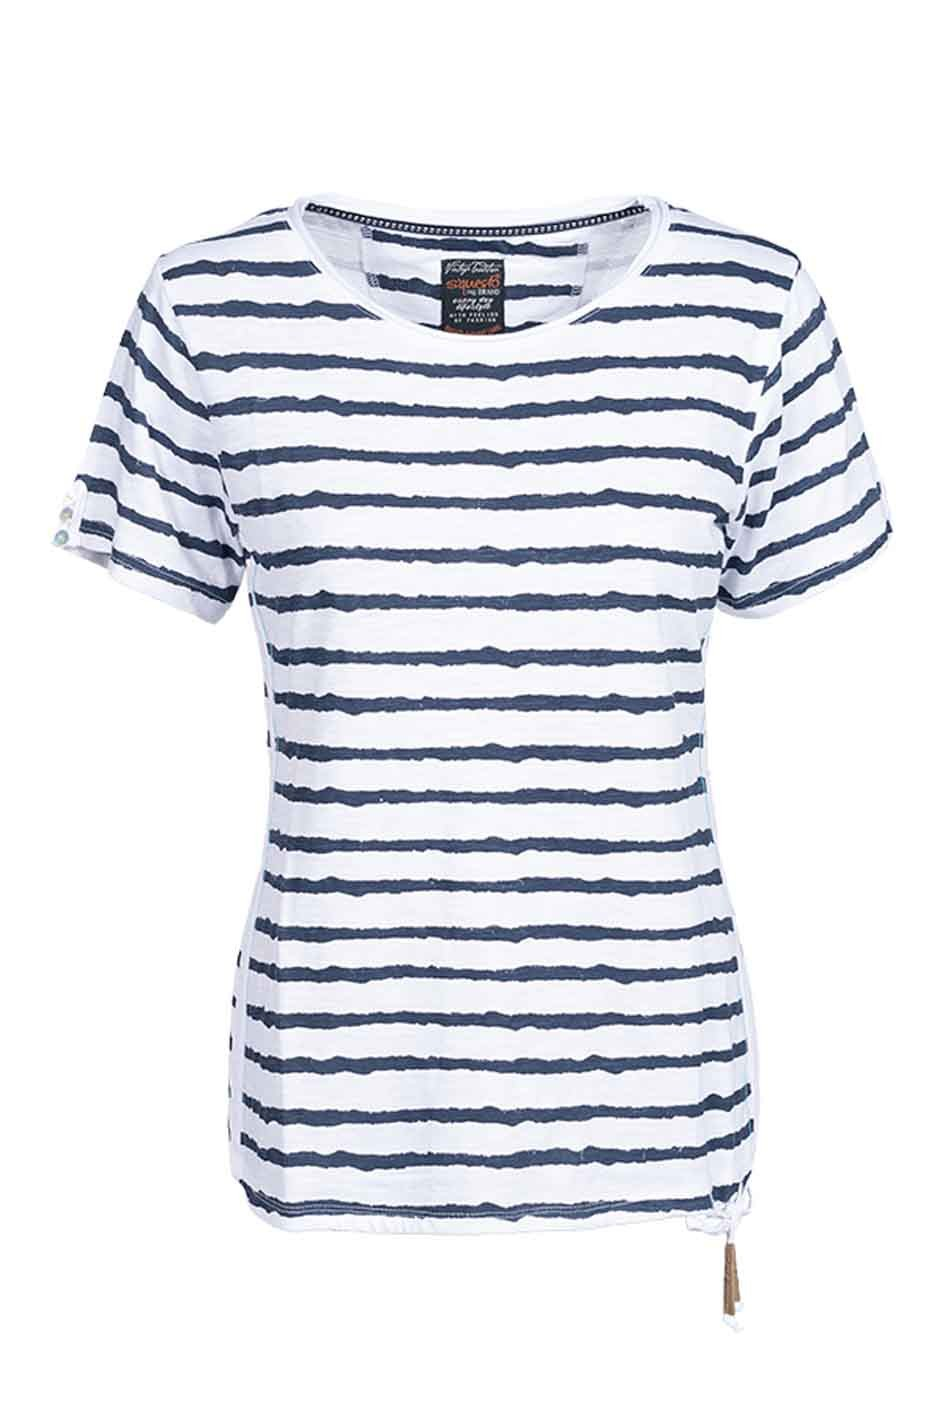 Soquesto Shirt Iranda